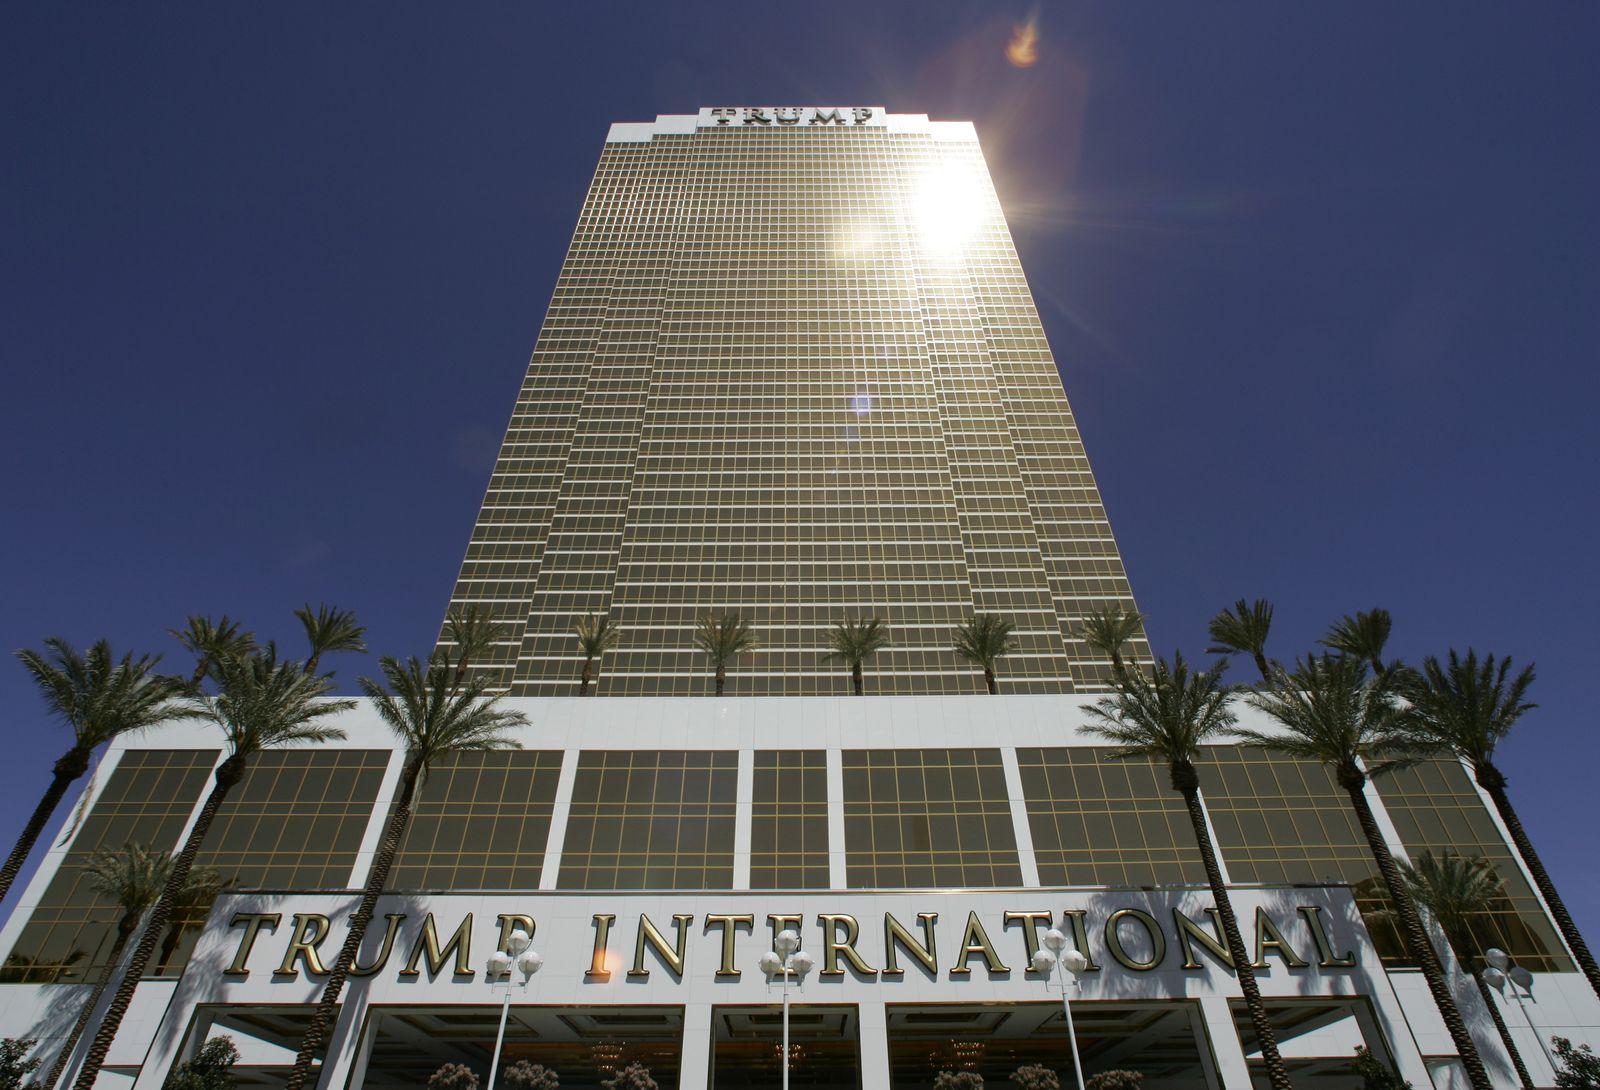 Trump International / Hotel / Las Vegas